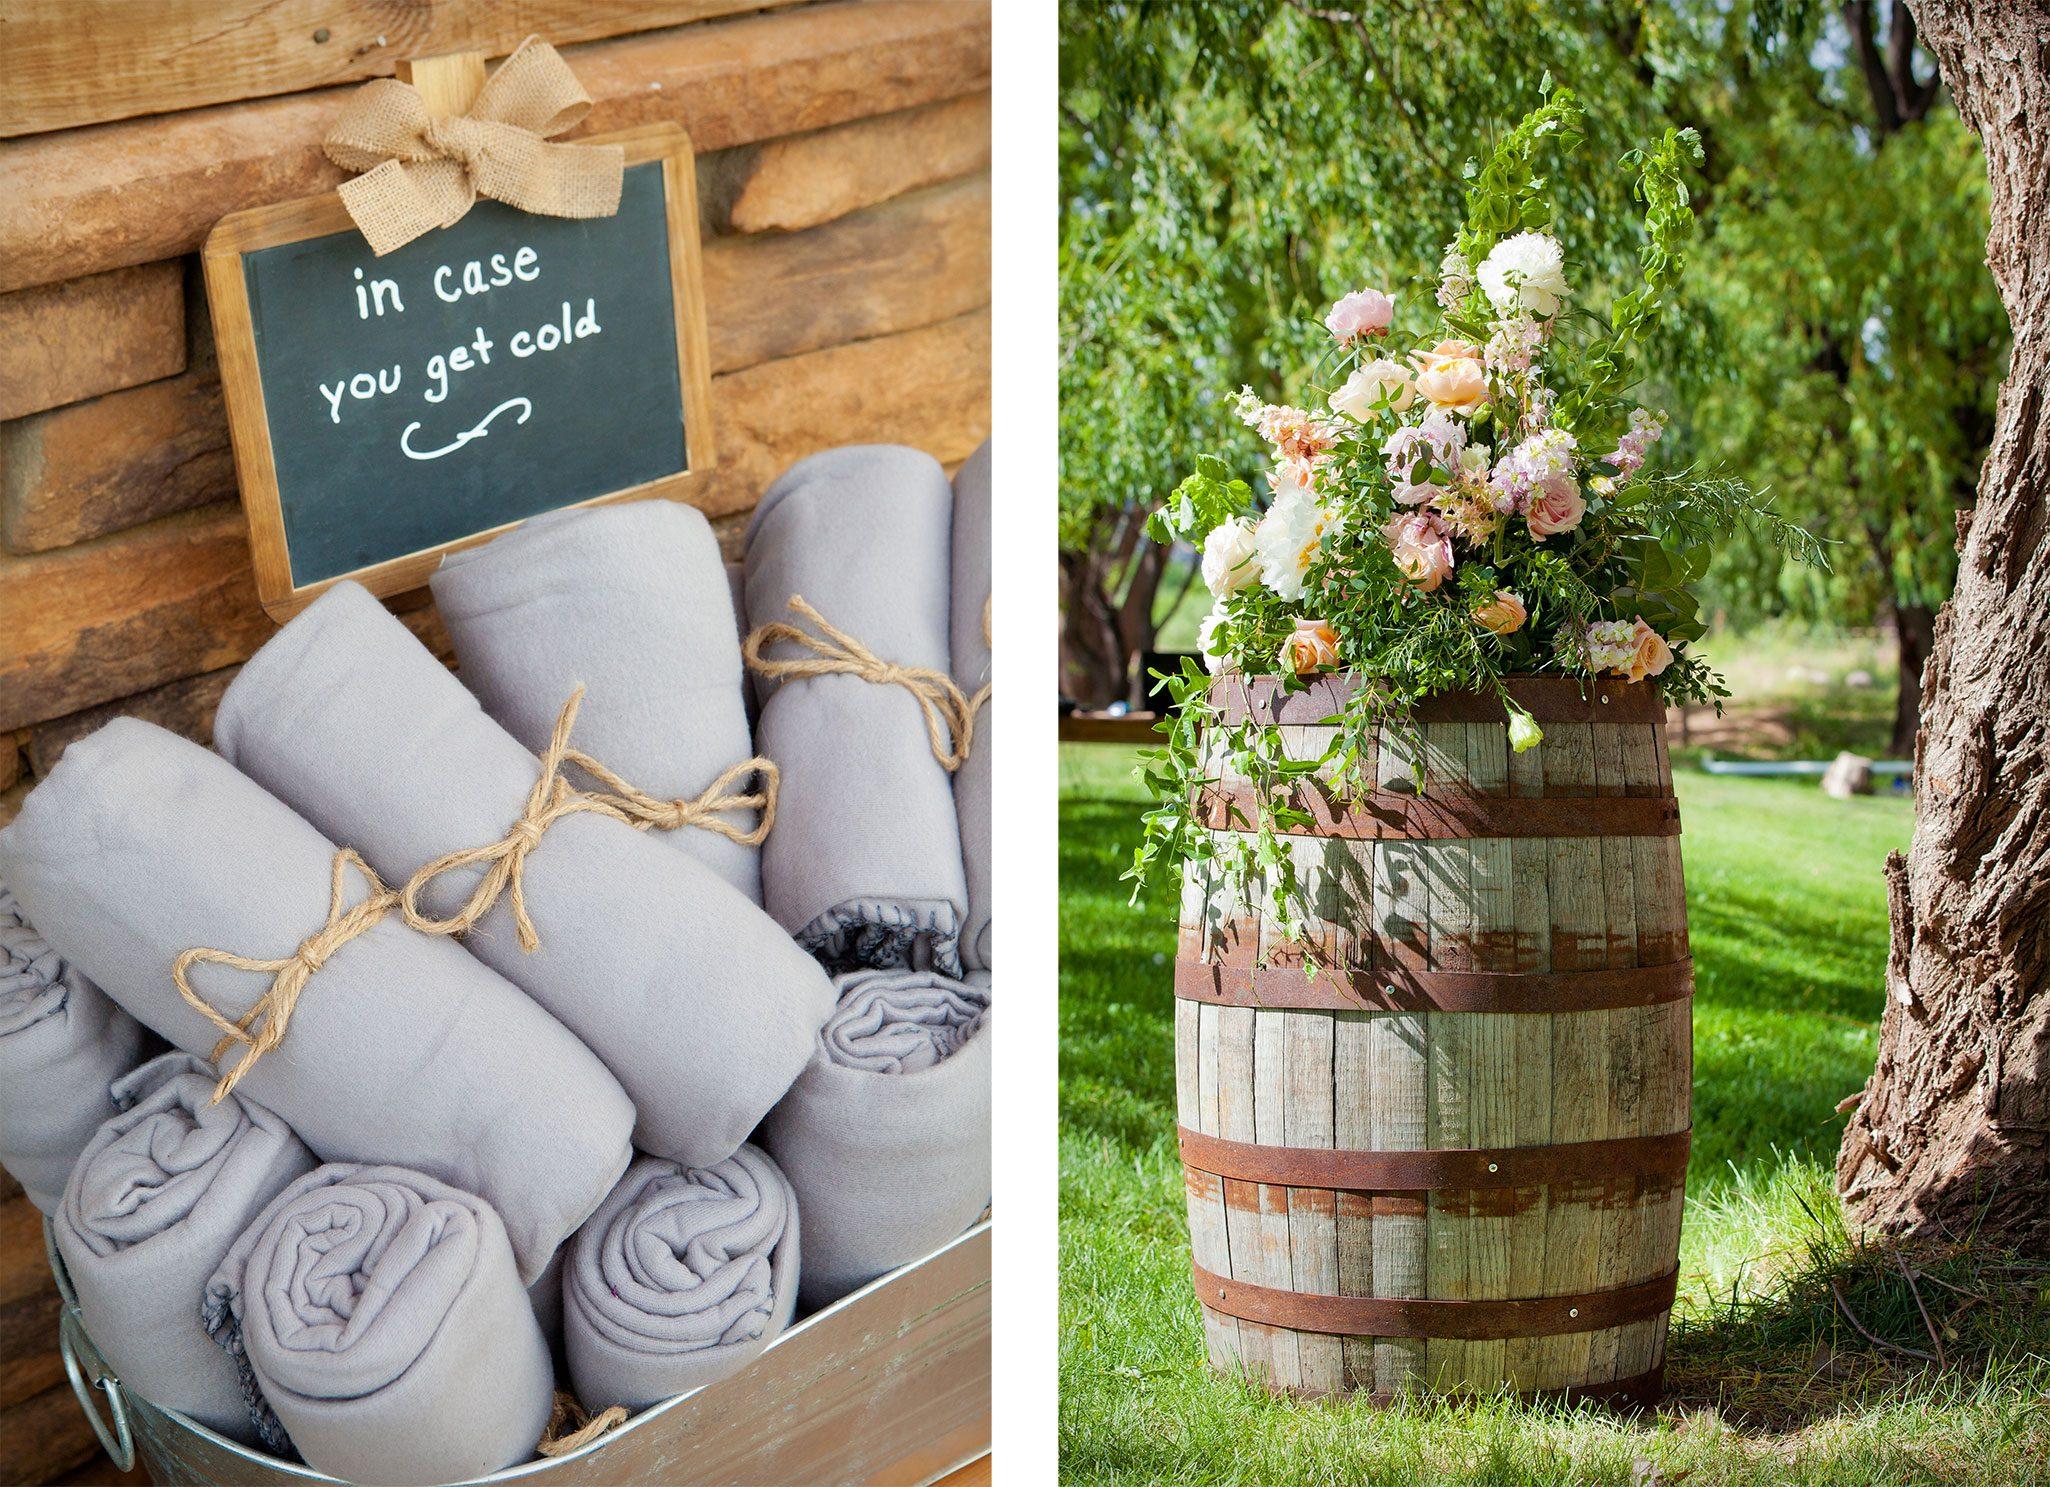 wedding bouquet on wine barrel. Fleece blankets for ceremony